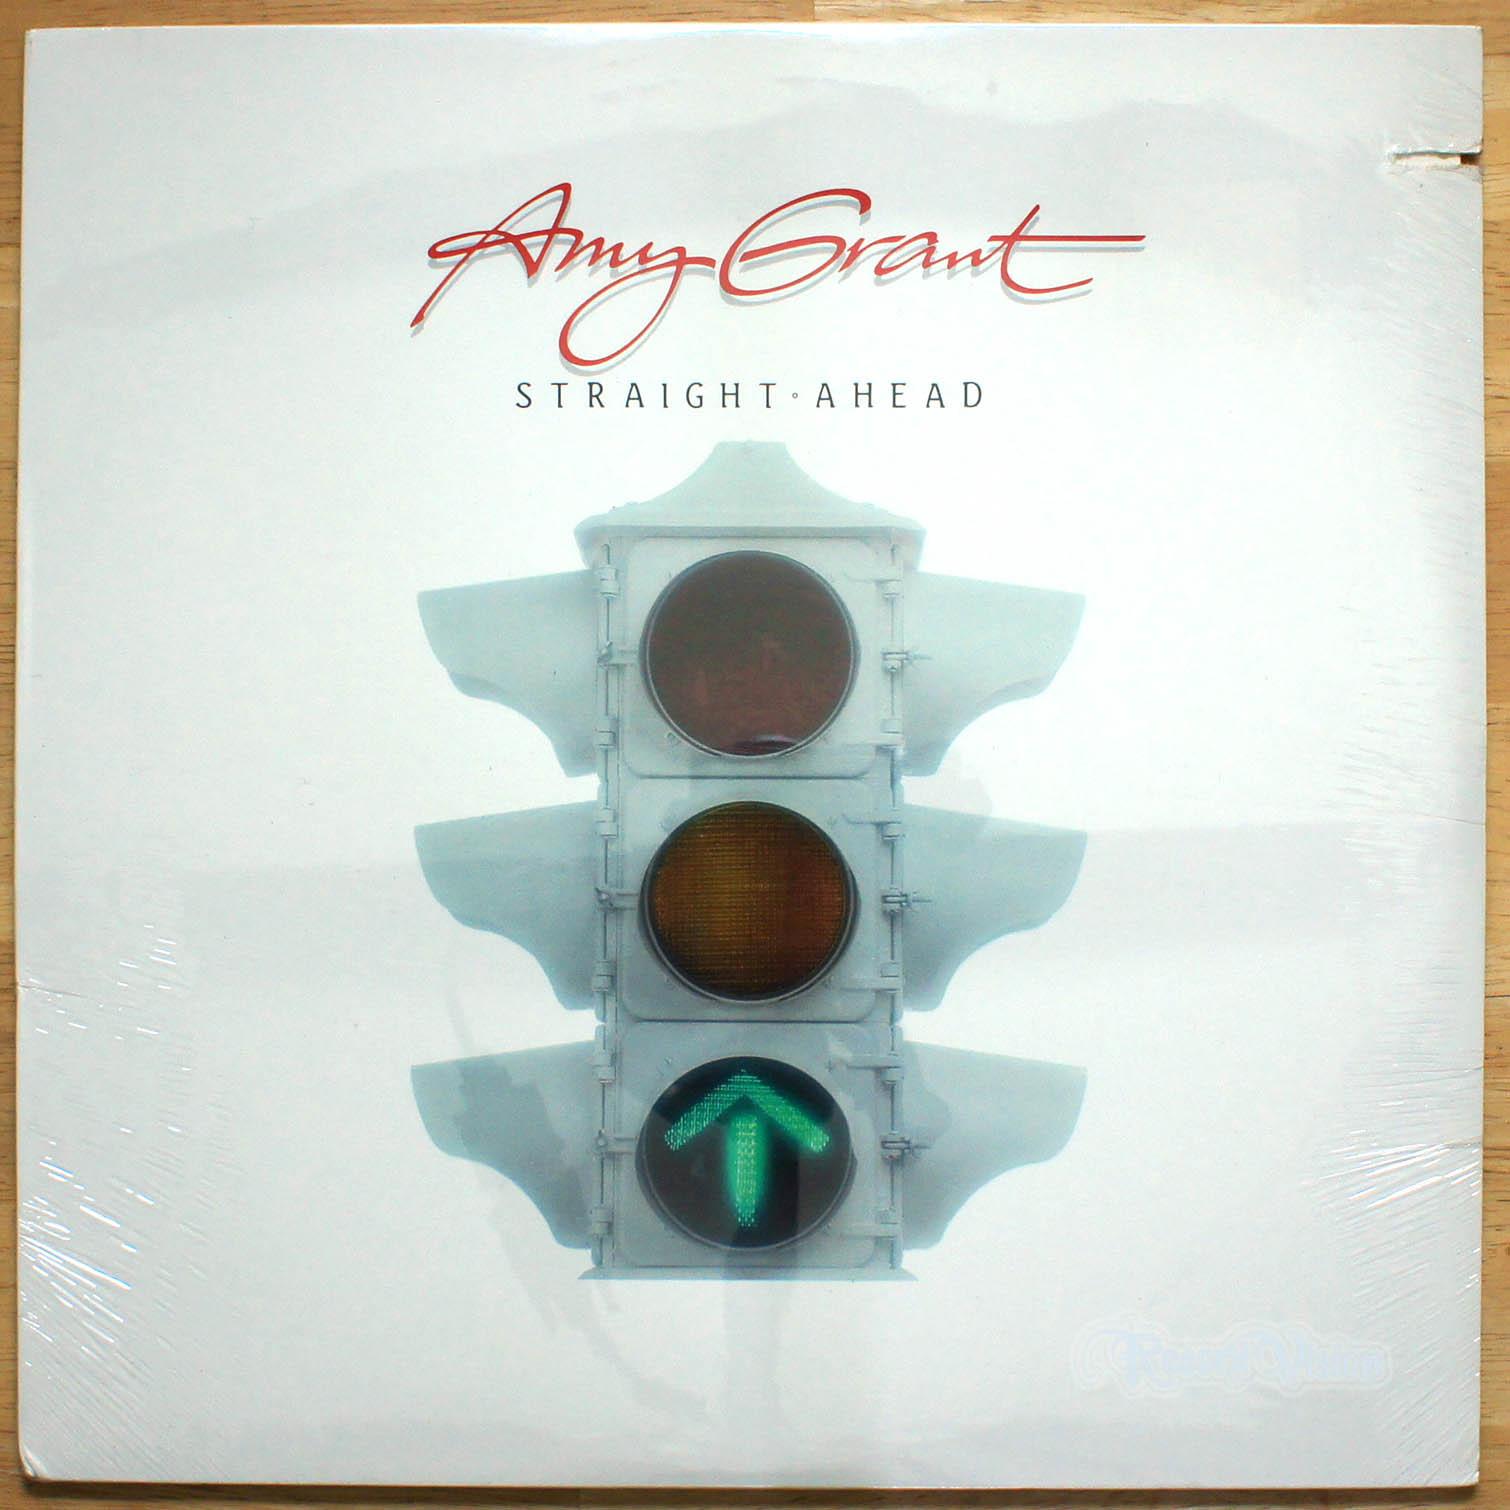 AMY GRANT - Straight Ahead - 33T